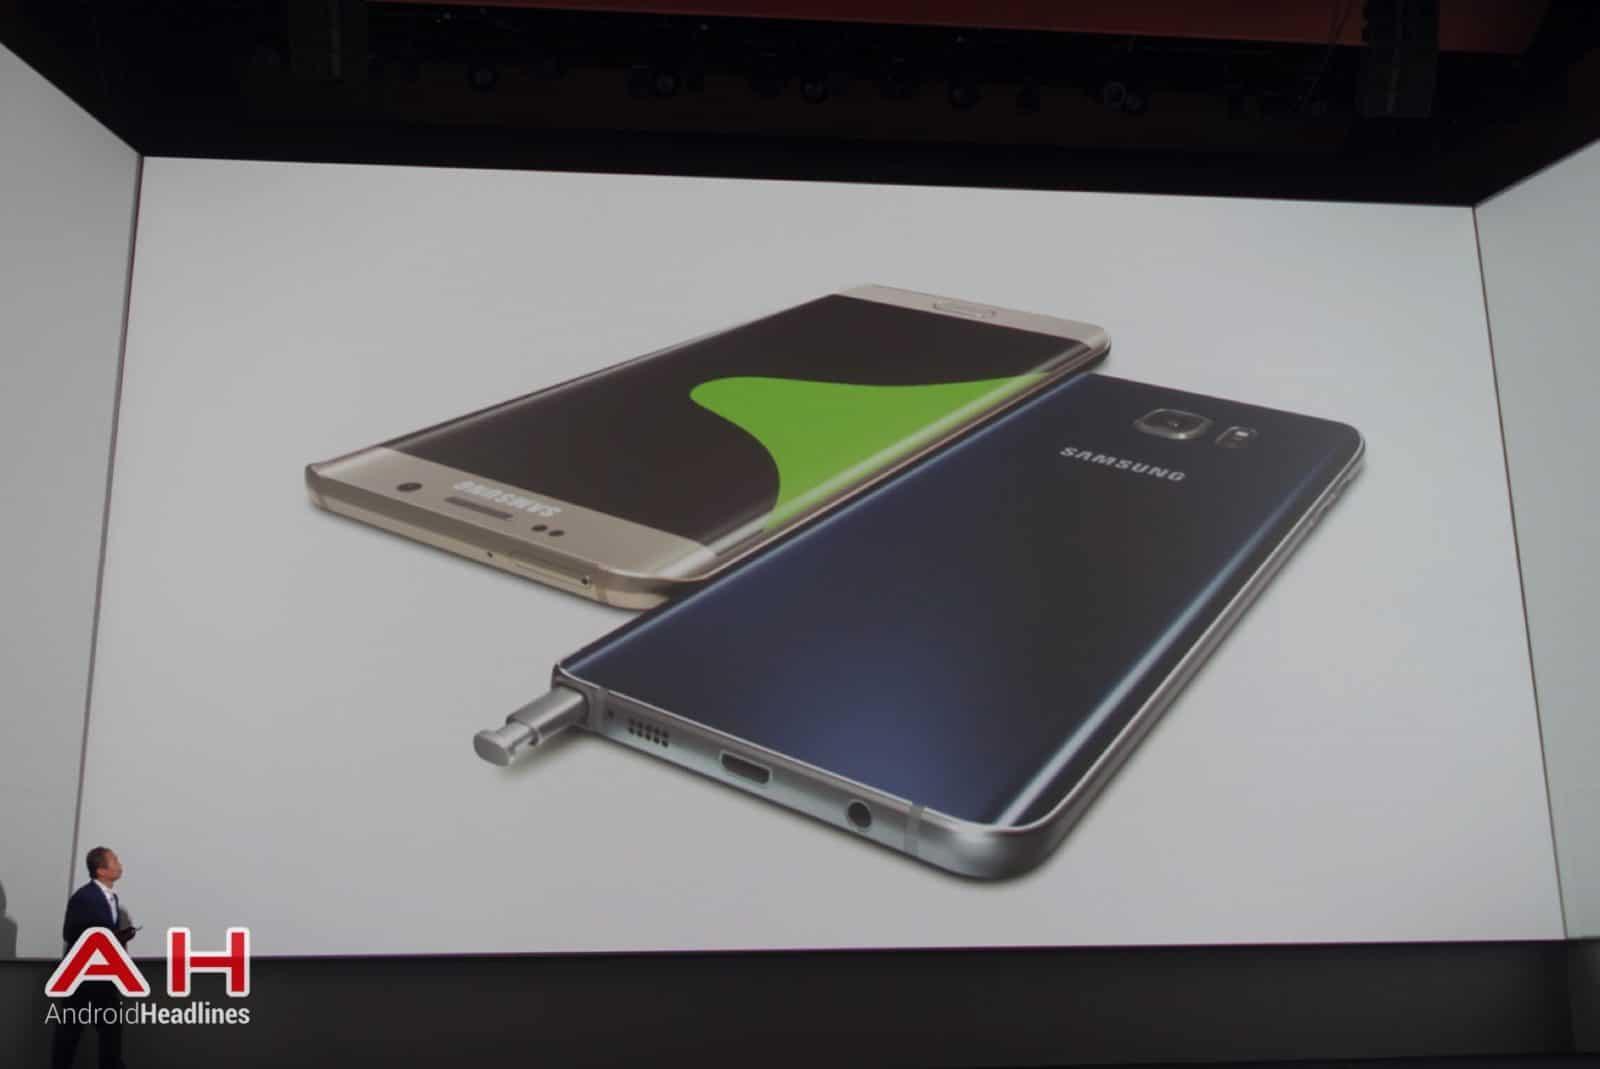 Samsung Unpacked 15 AH 12